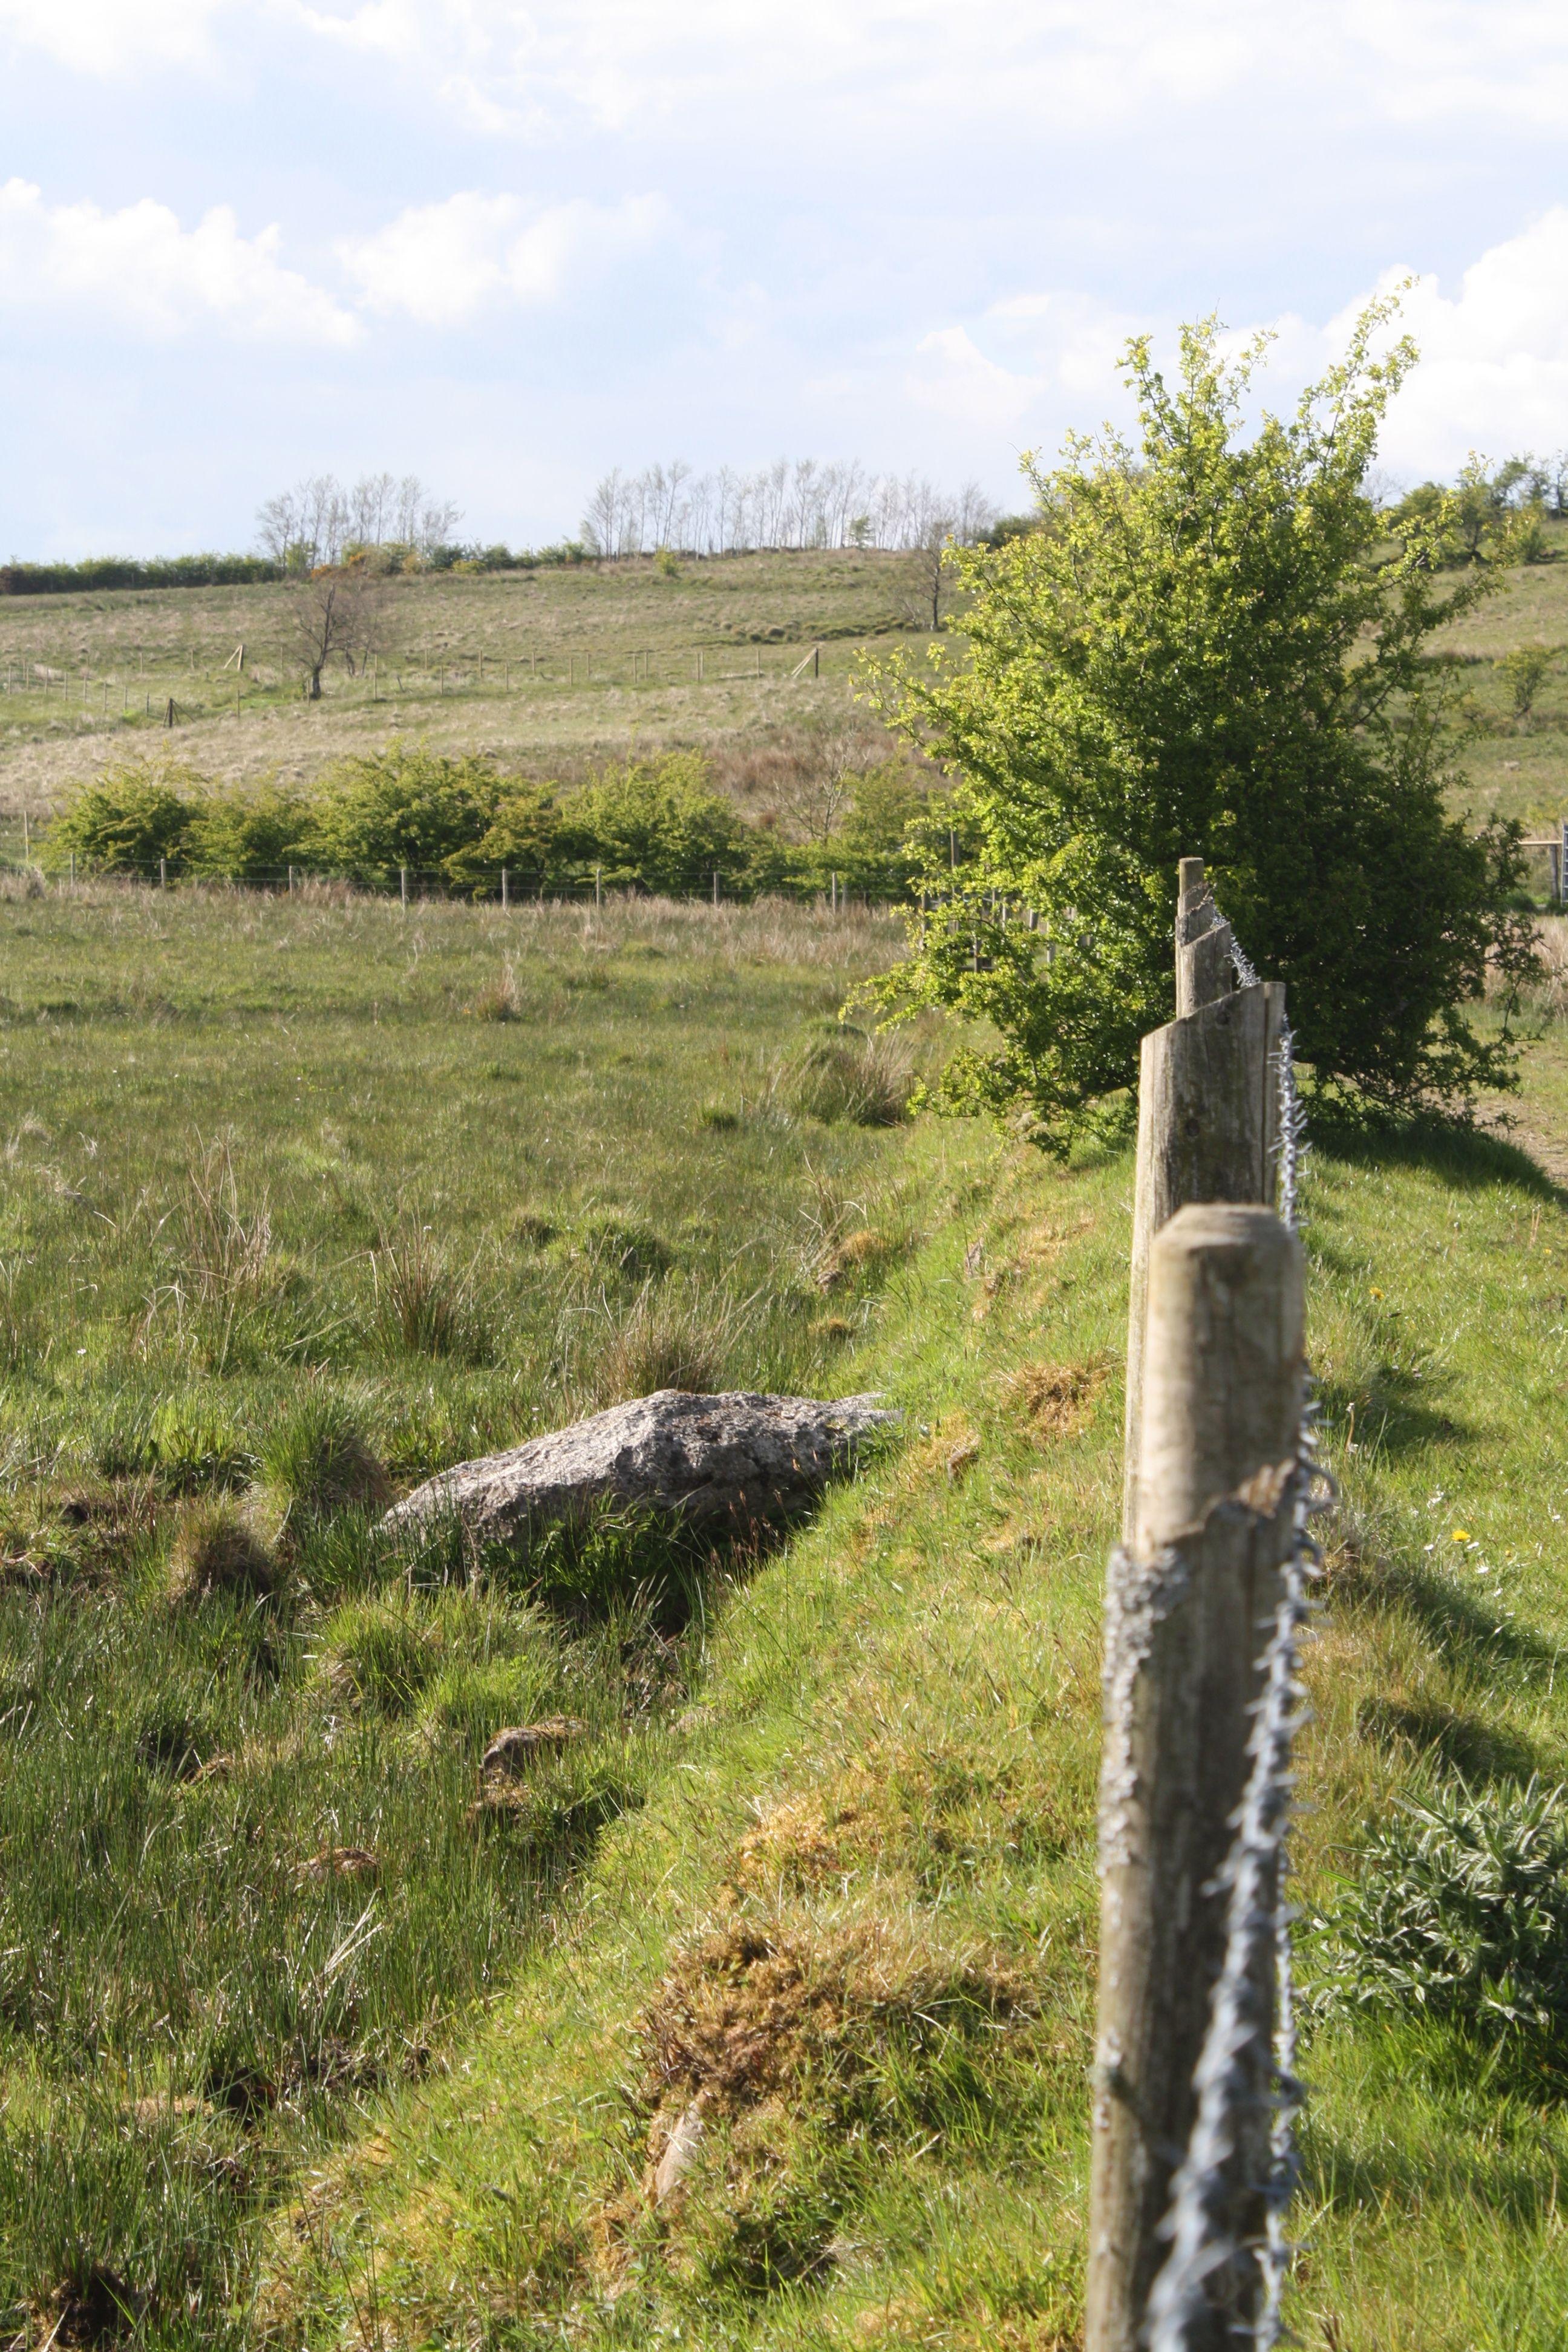 VANTAGE POINT:  Slievenacloy where Dúlra spotted the wheatear's nest